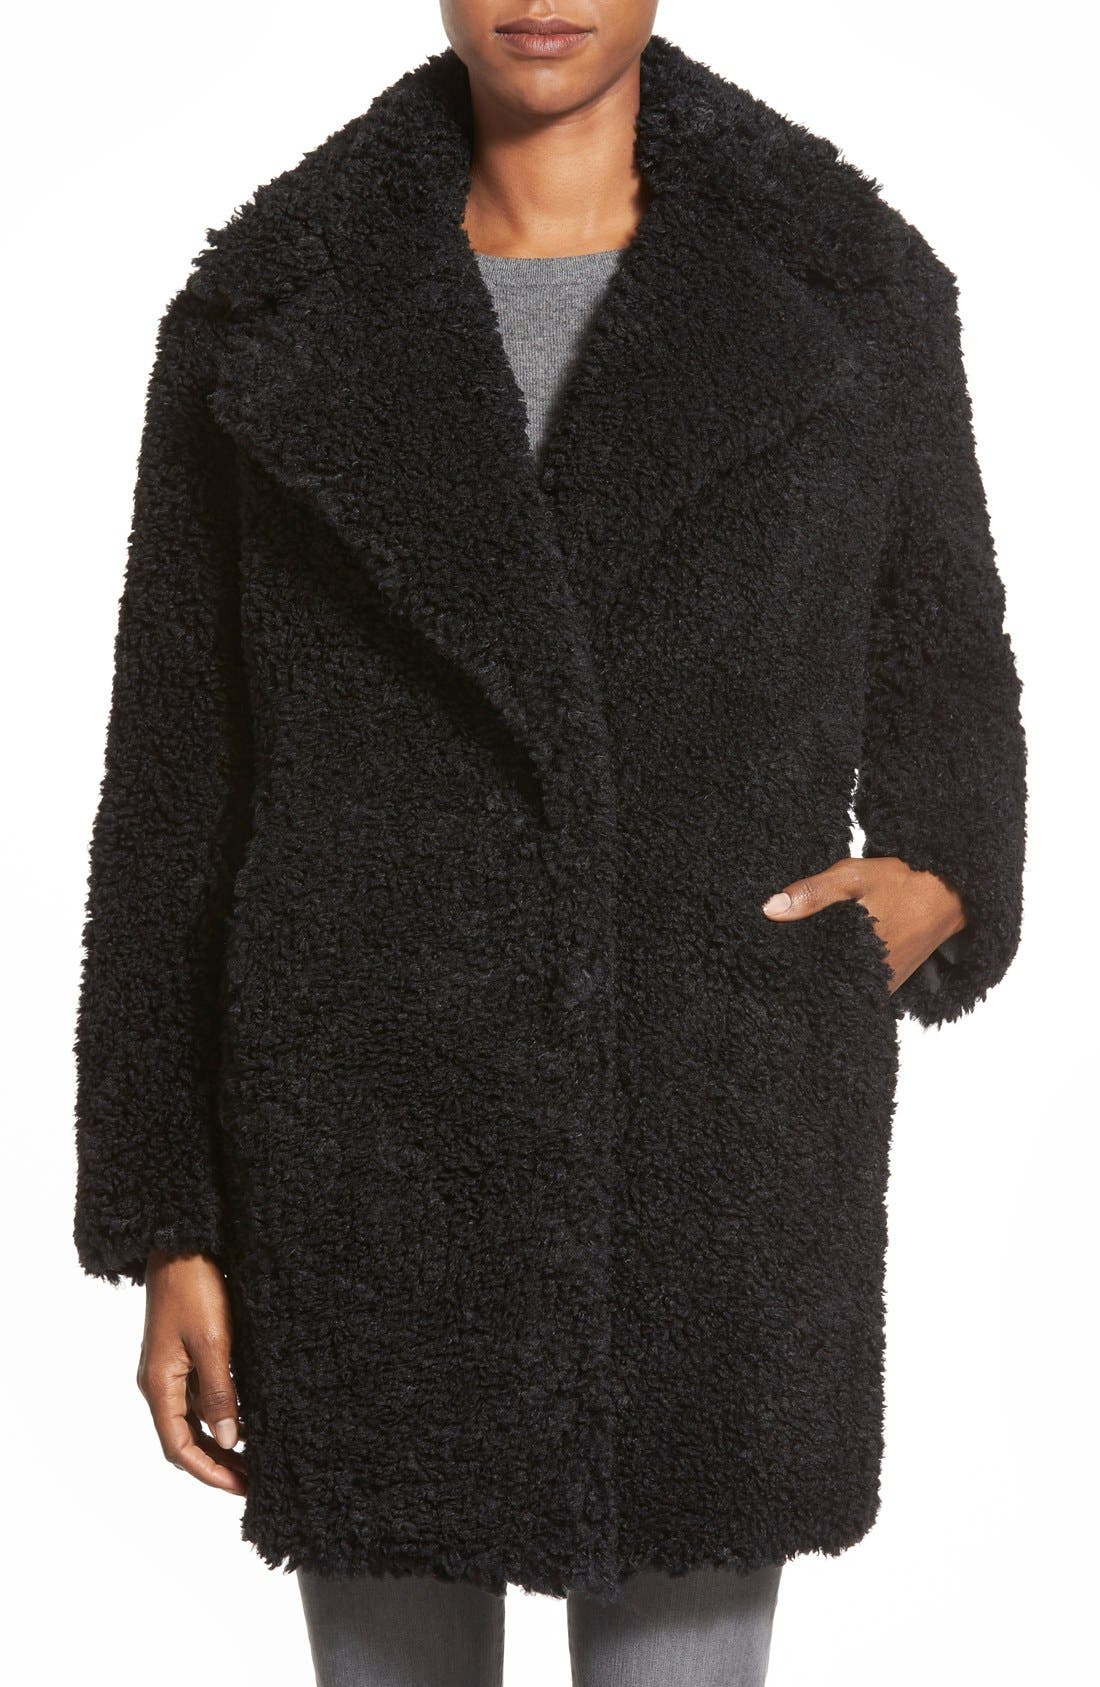 'Teddy Bear' Notch Collar Reversible Faux Fur Coat,                             Main thumbnail 1, color,                             001